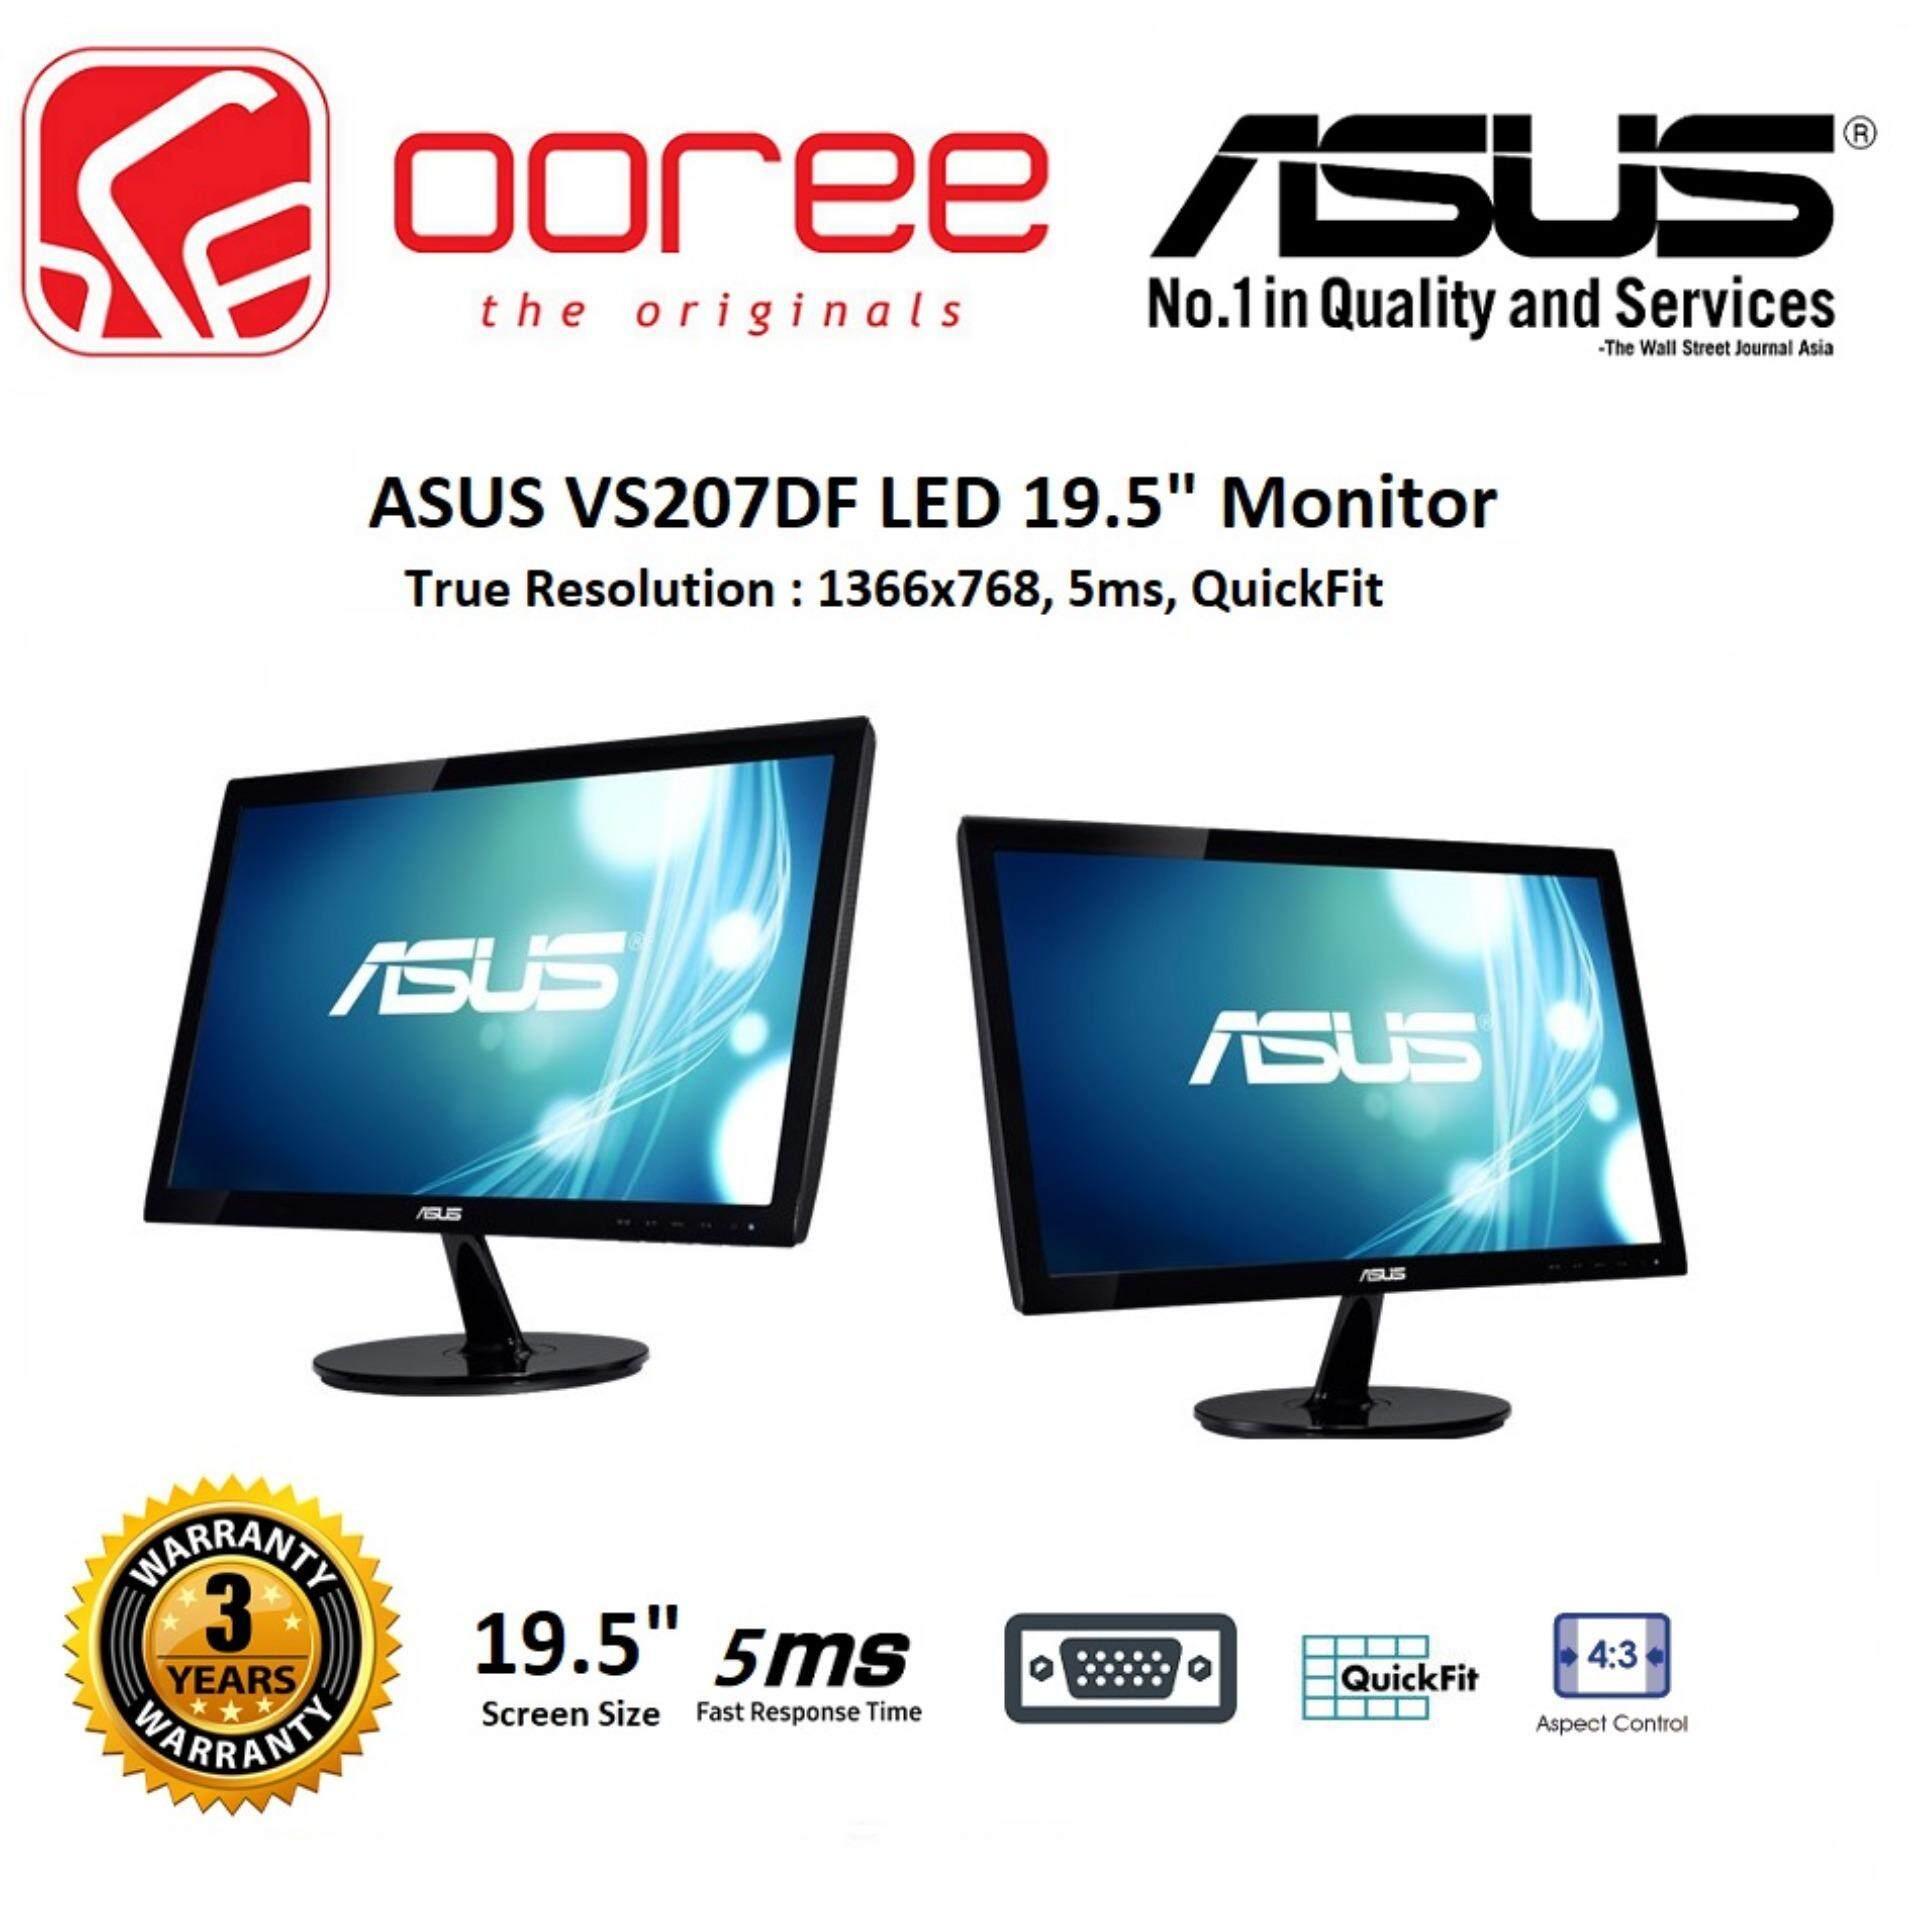 ASUS 19.5 VS207DF LED FLAT HD READY (RESOLUTION: 1366x768) TN LCD MONITOR (5MS RESPONSE TIME, VGA INPUT, NO SPEAKER, VESA WALL MOUNT) 3YEARS WARRANTY, BLACK COLOUR Malaysia